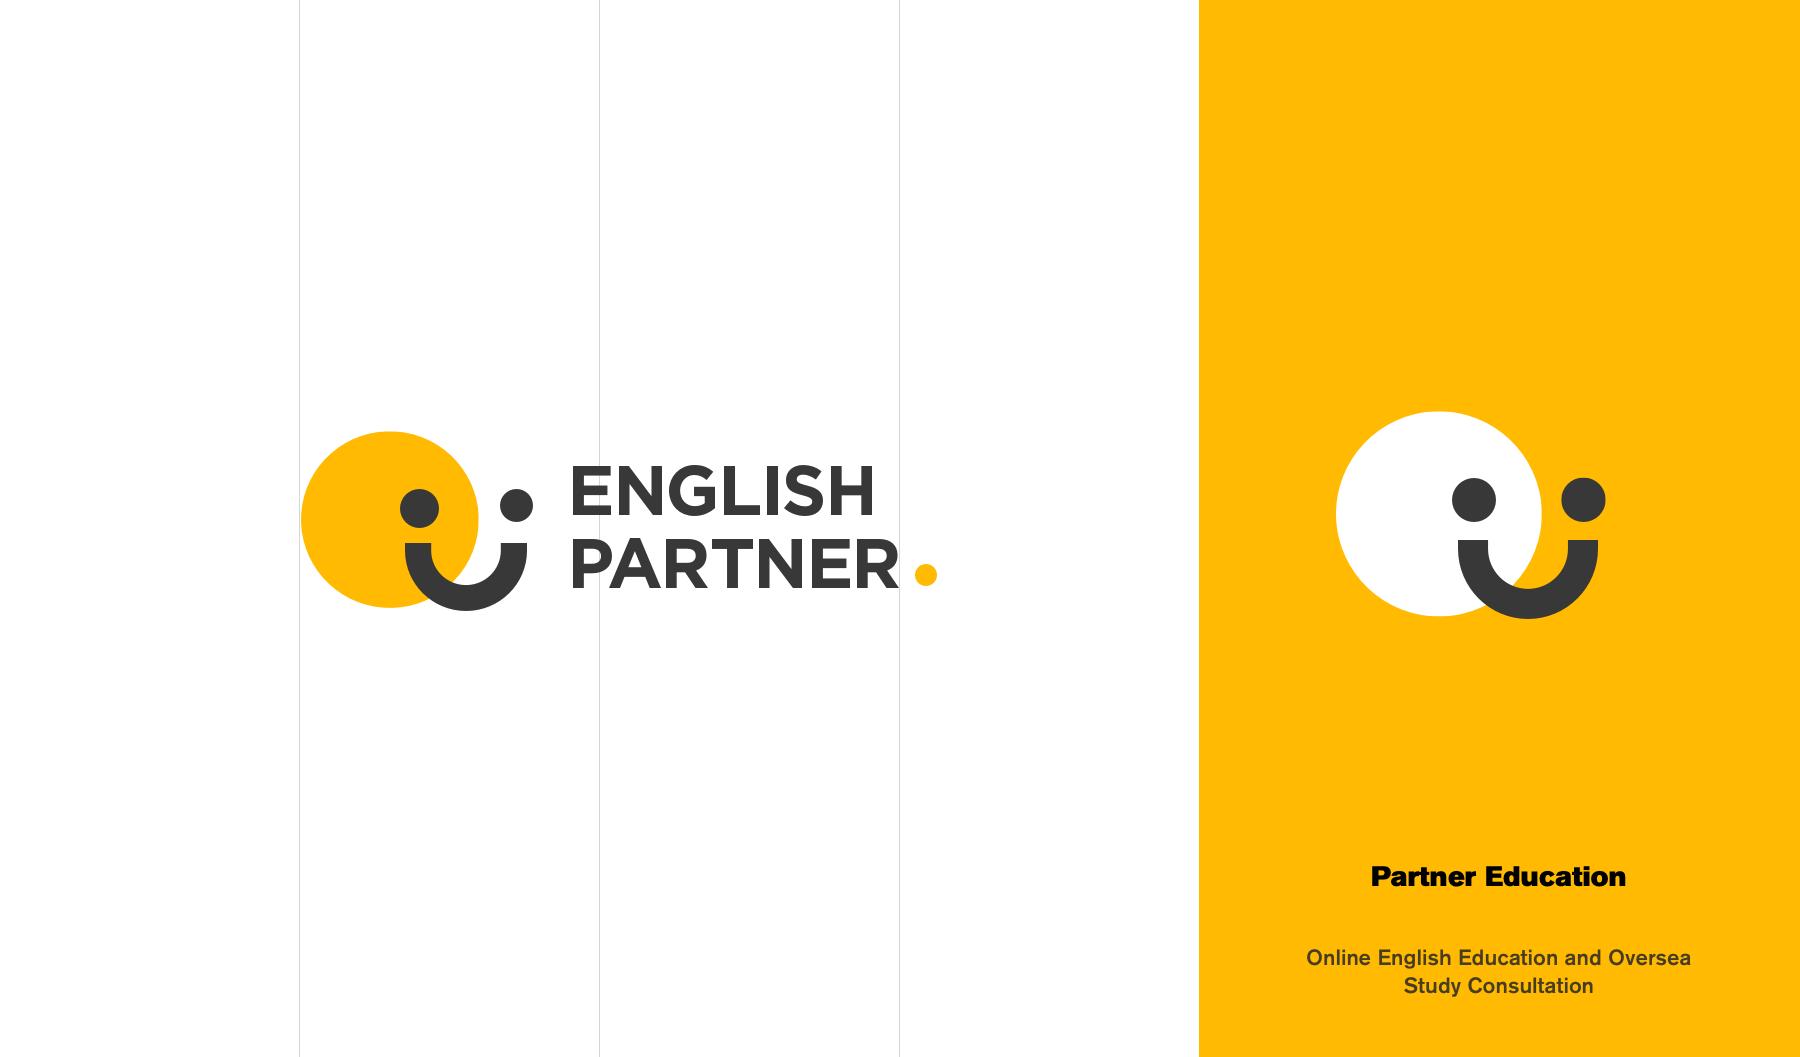 English Partnet